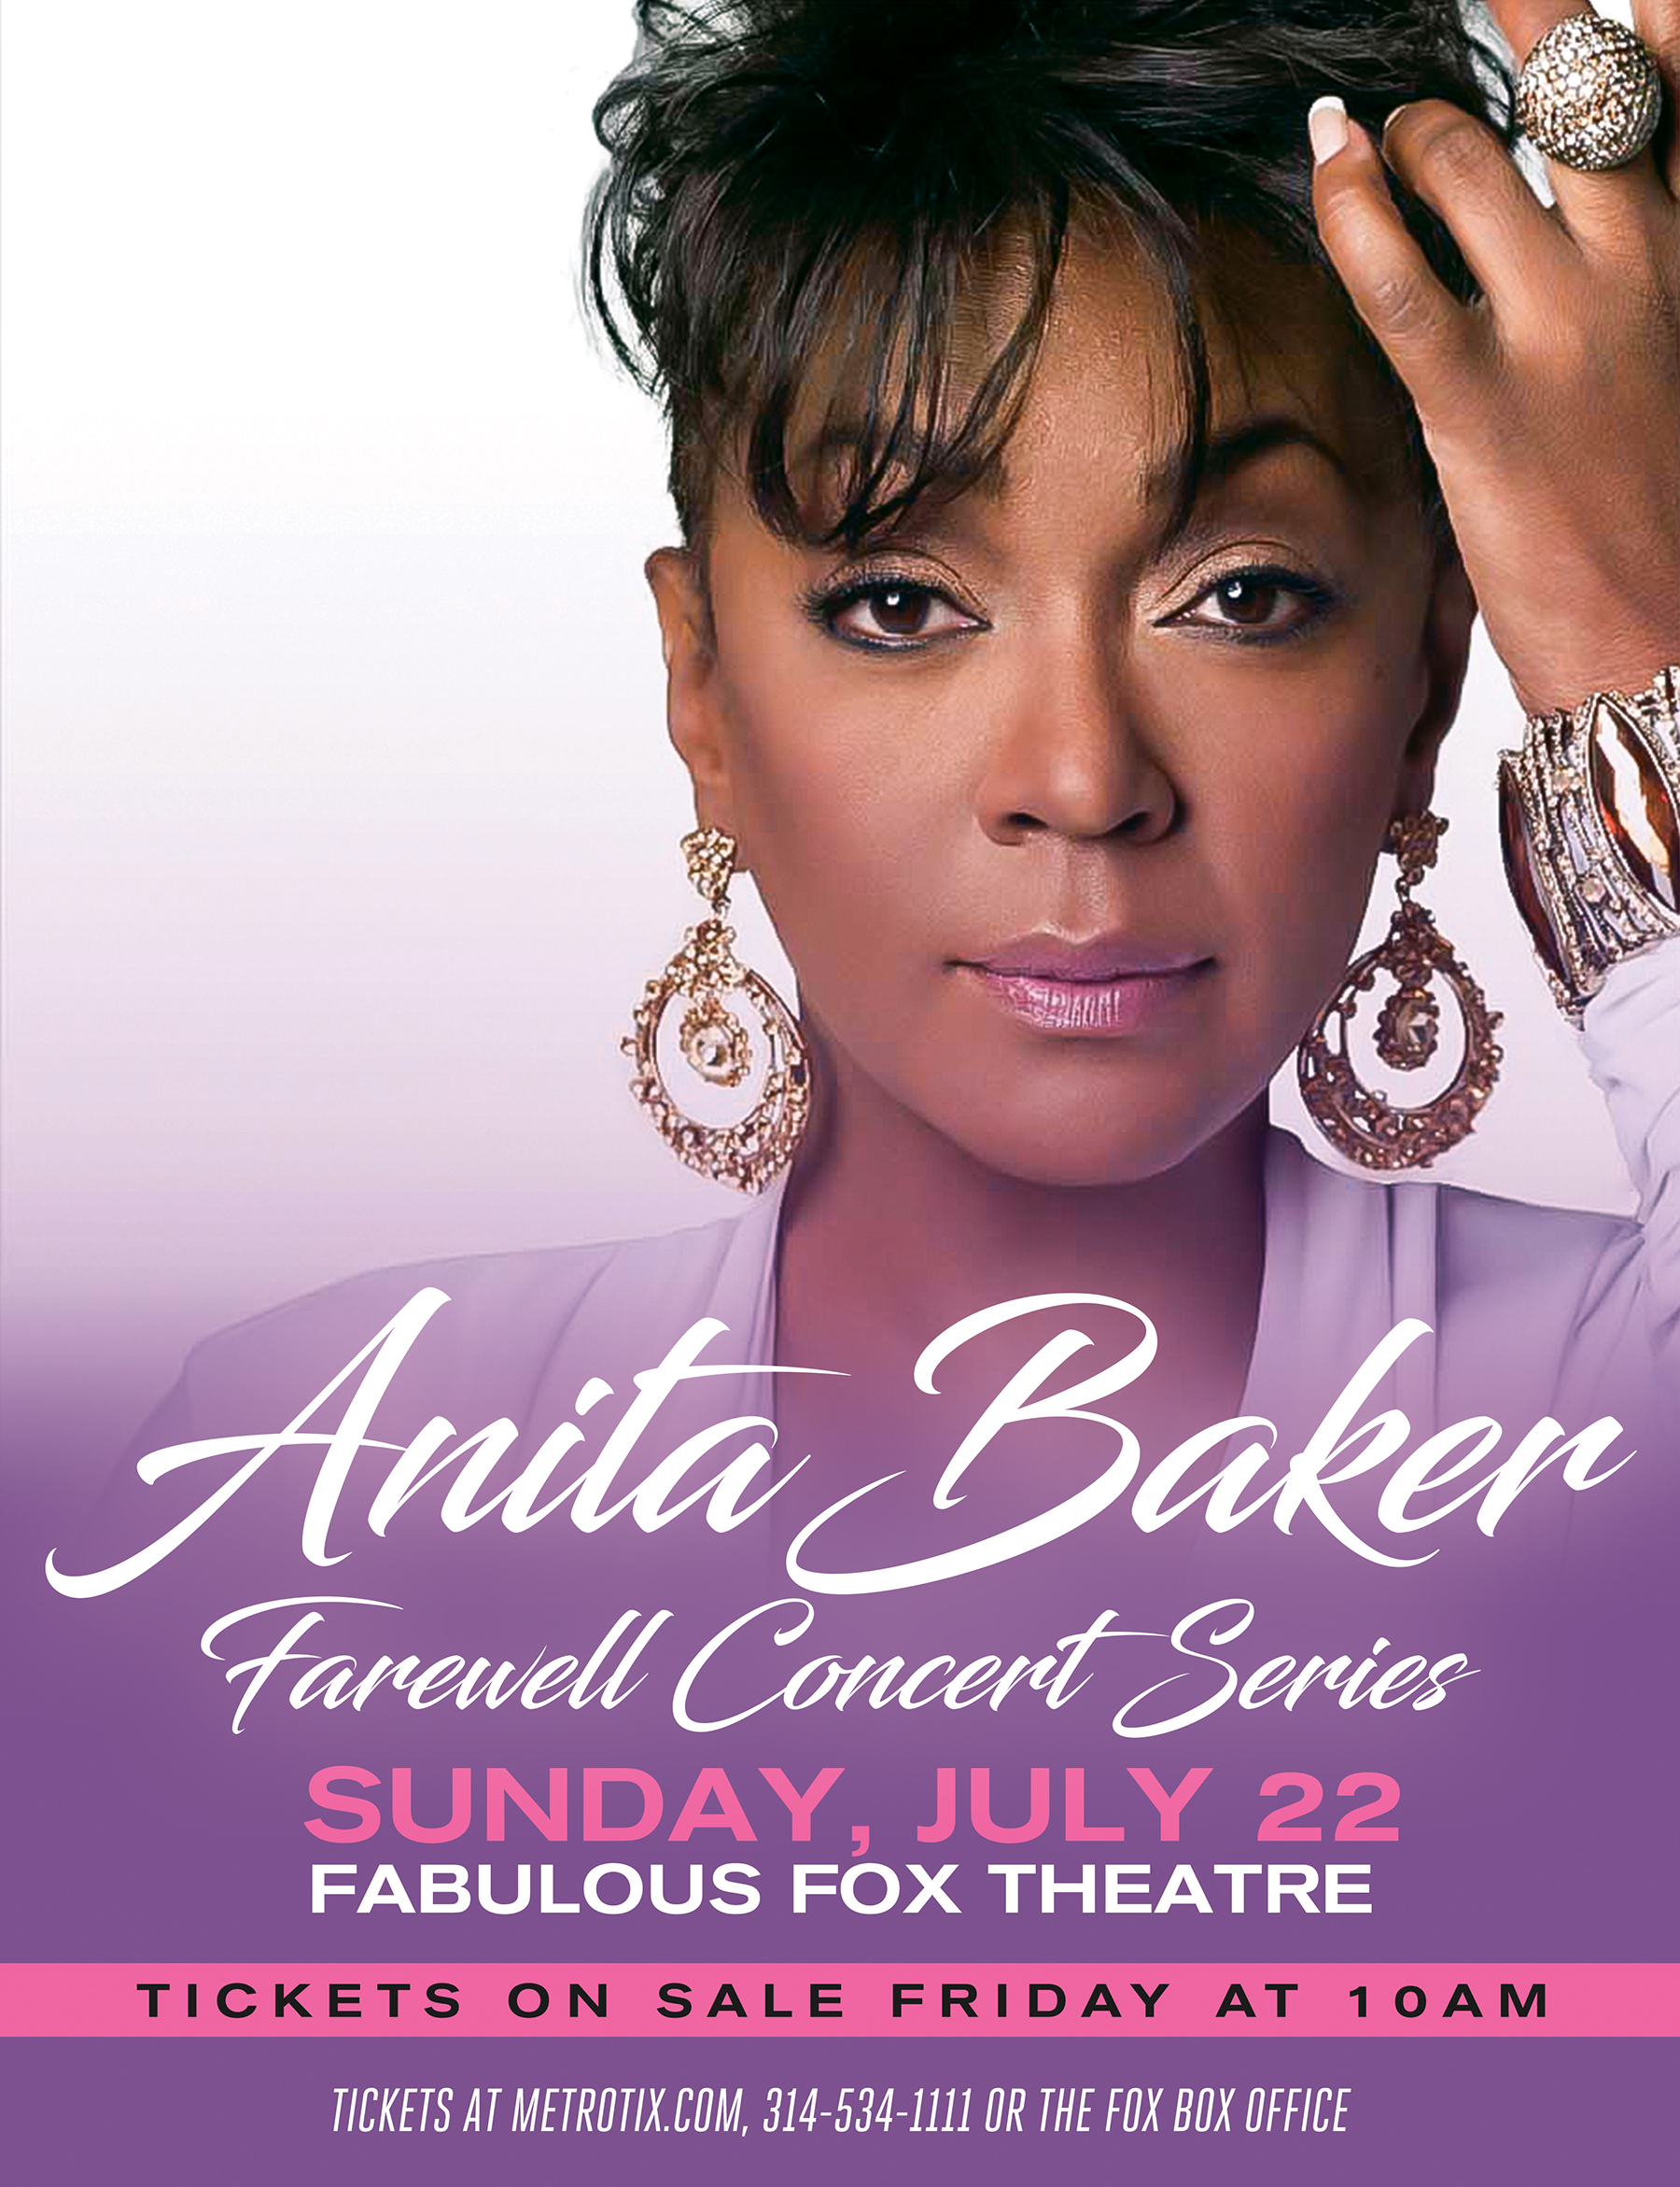 Anita Baker In St. Louis